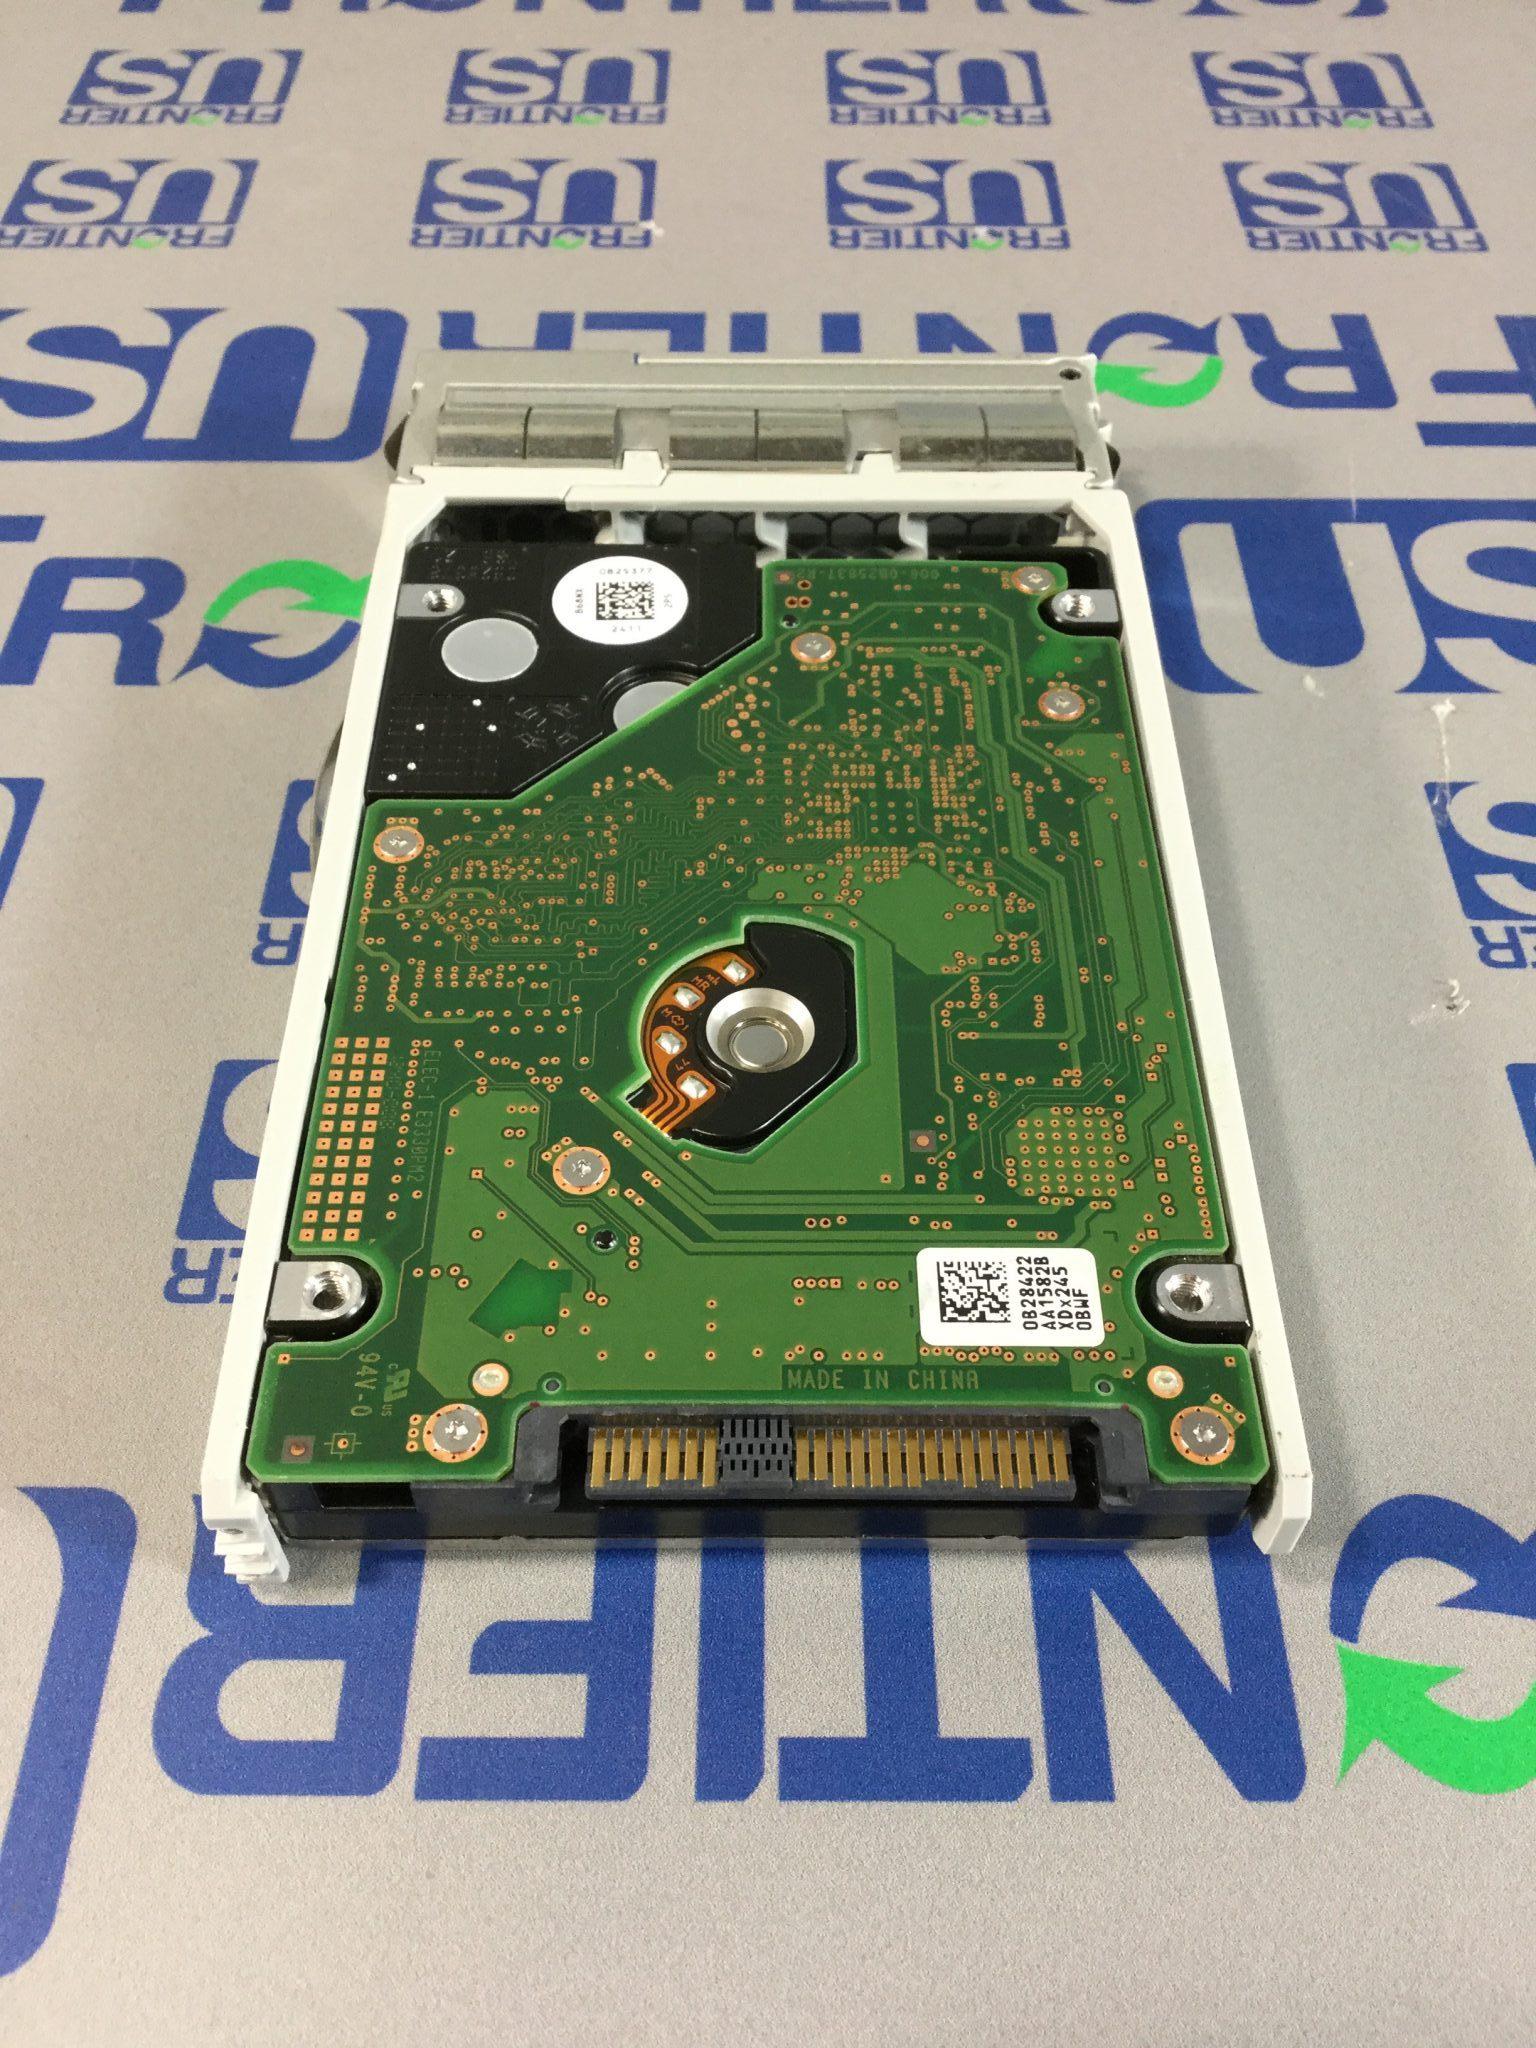 SUN 300GB-10000RPM 6G 2.5 SAS Drive 542-0388 | FrontierUS